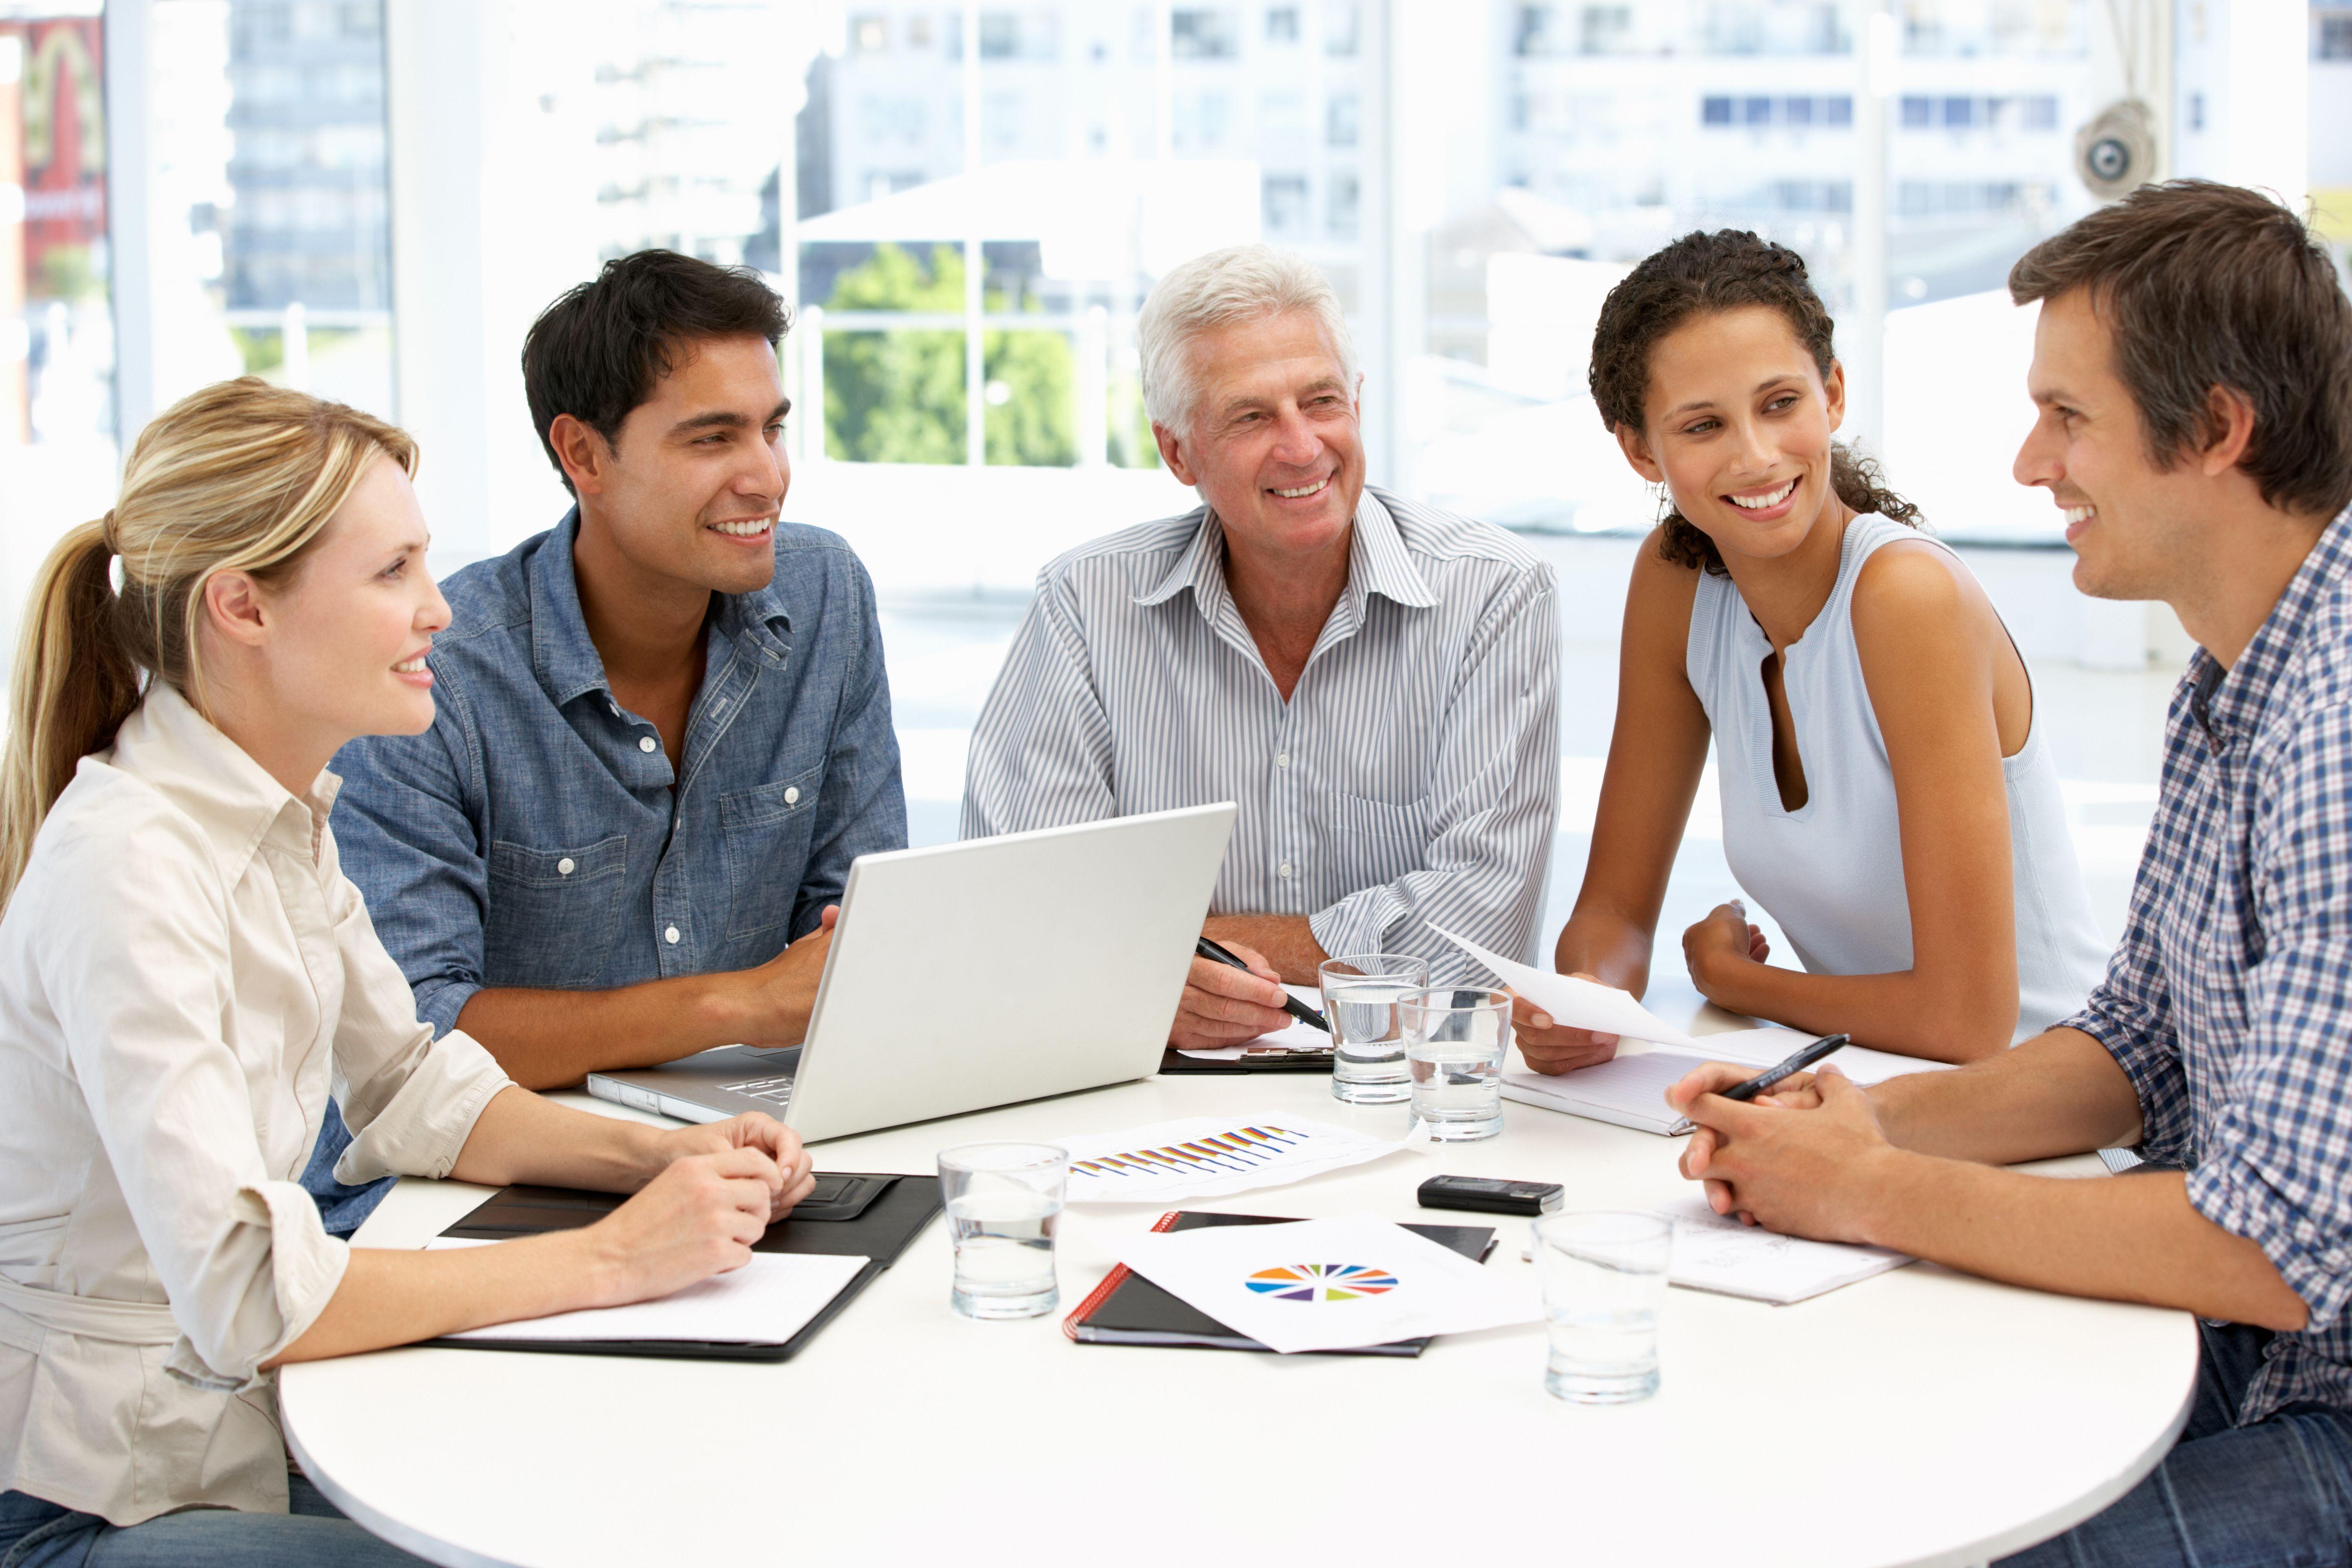 Familienbewusste Personalpolitik, flexible Arbeitszeitmodelle, Mehrgenerationen